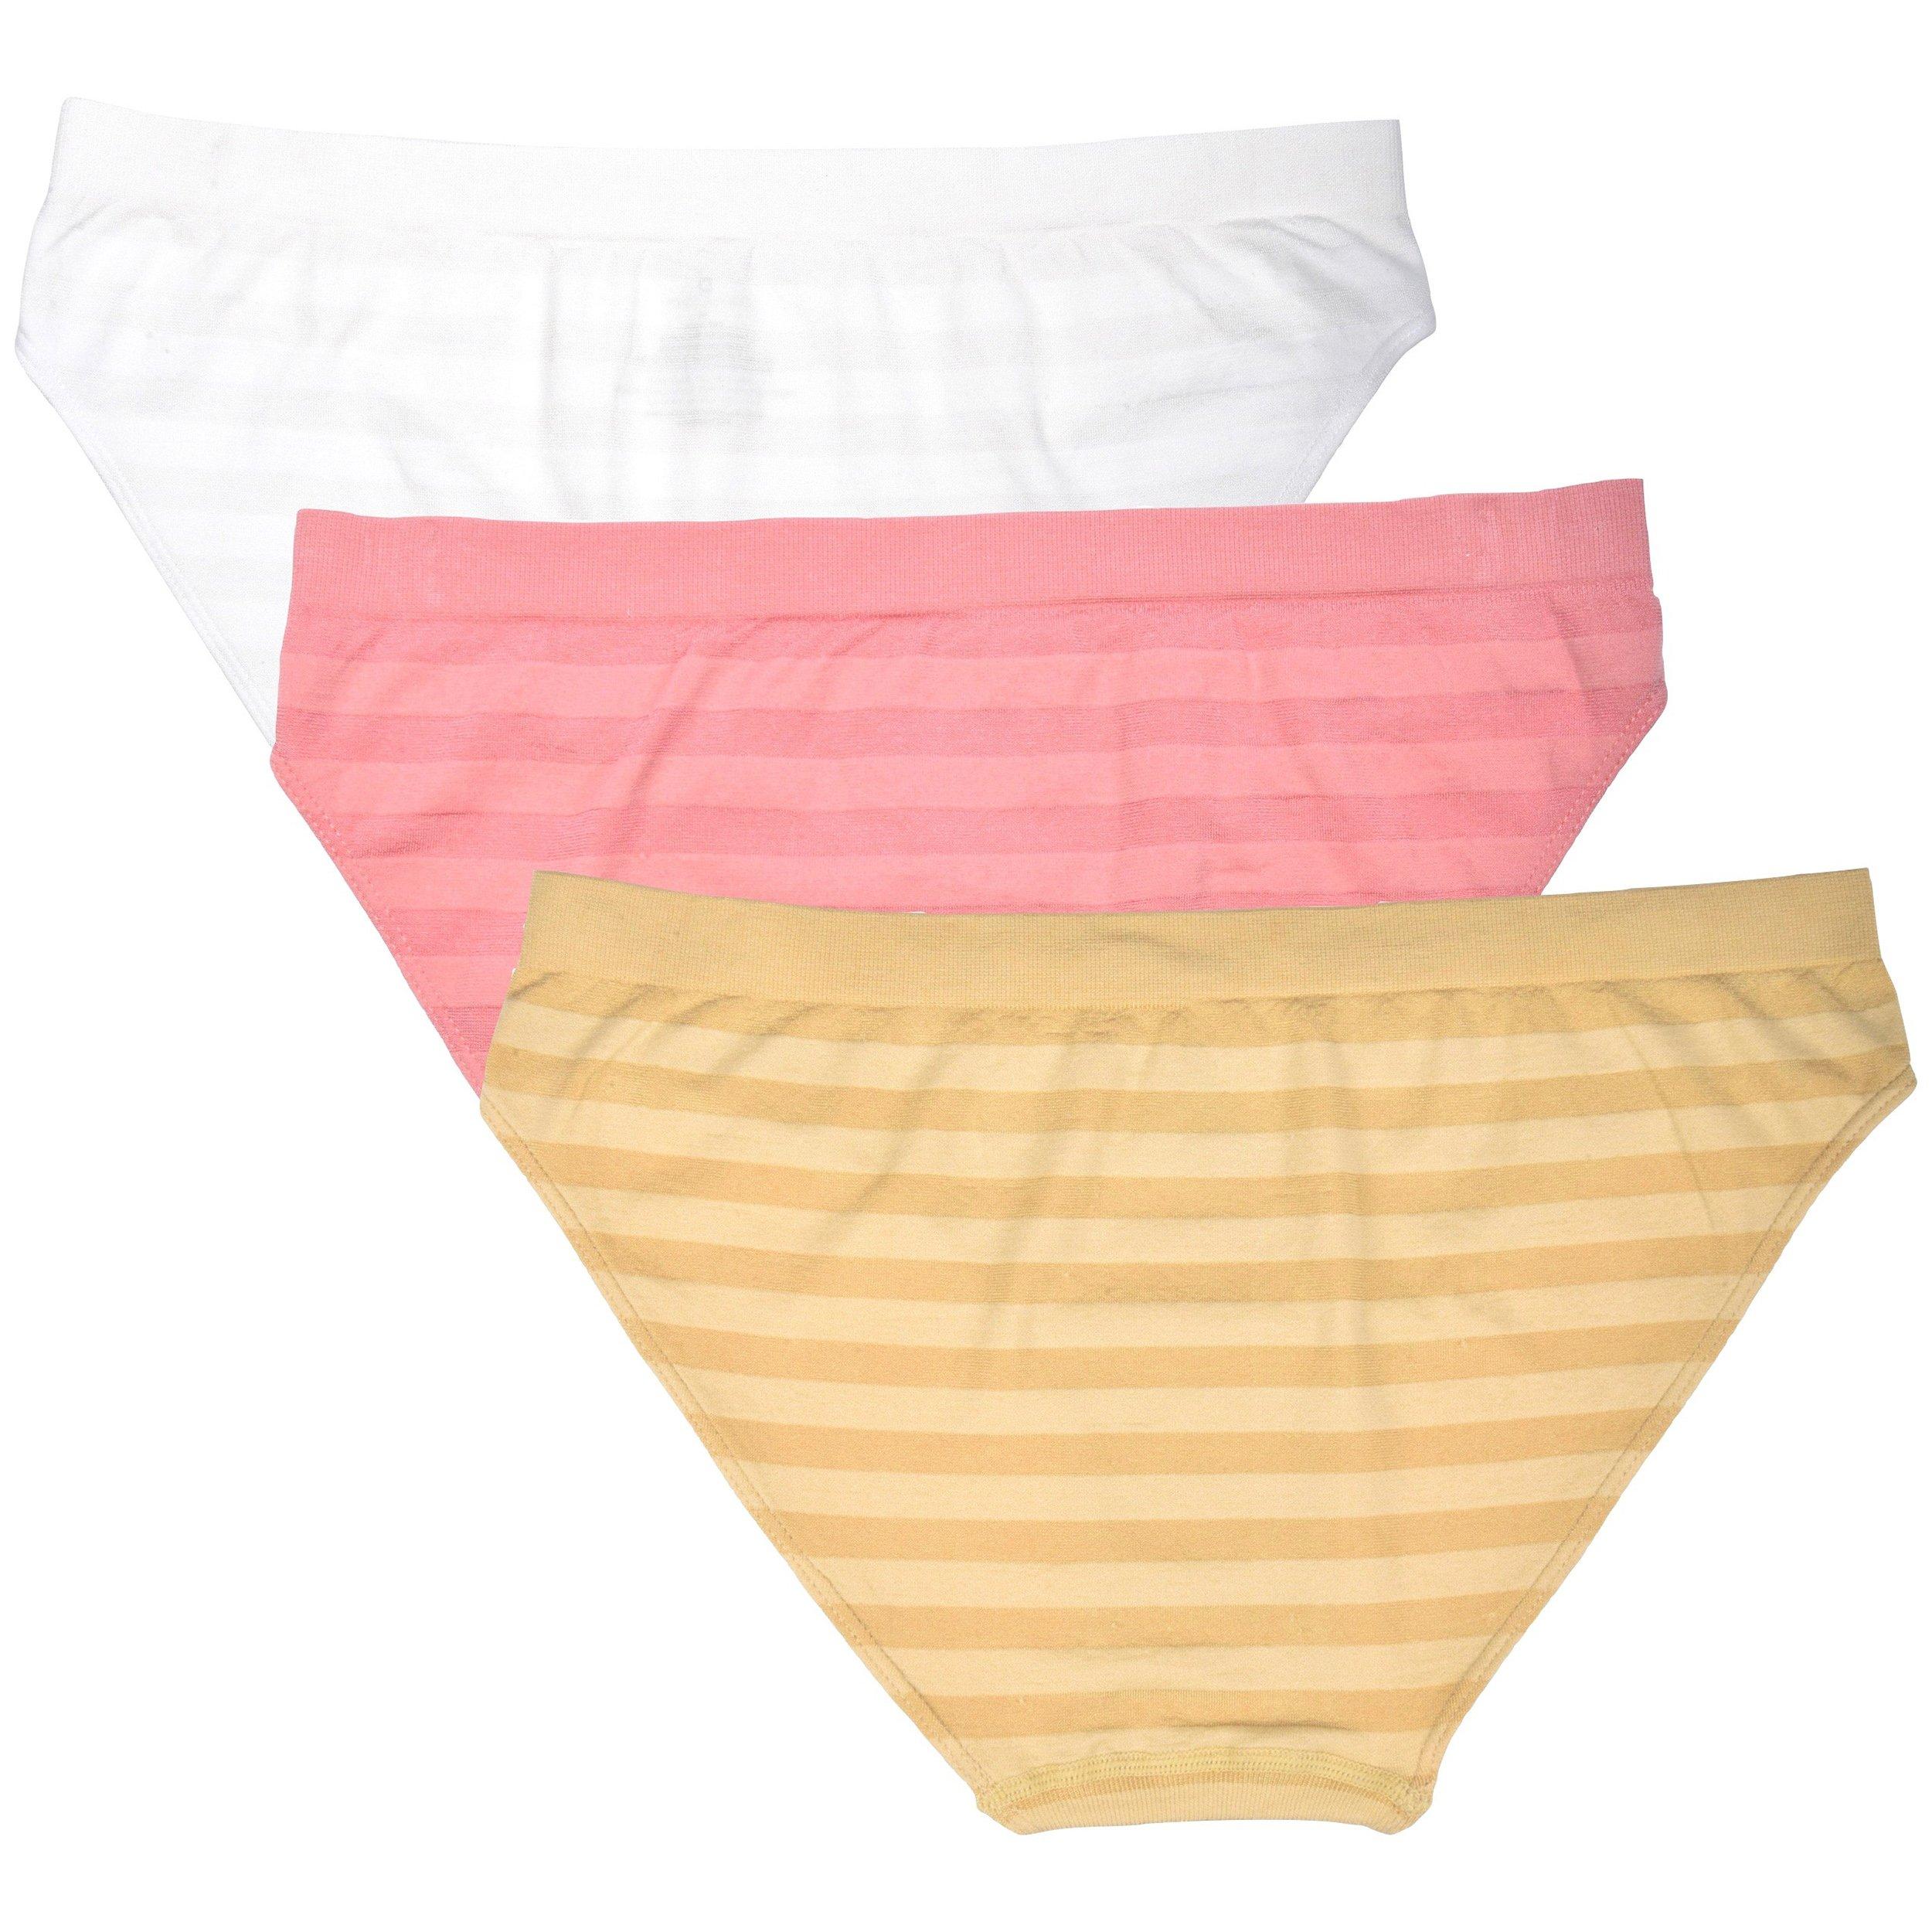 Donna-Loren-Women-039-s-Bikinis-Panties-3-Pack-High-Quality-Underwear-Briefs thumbnail 8